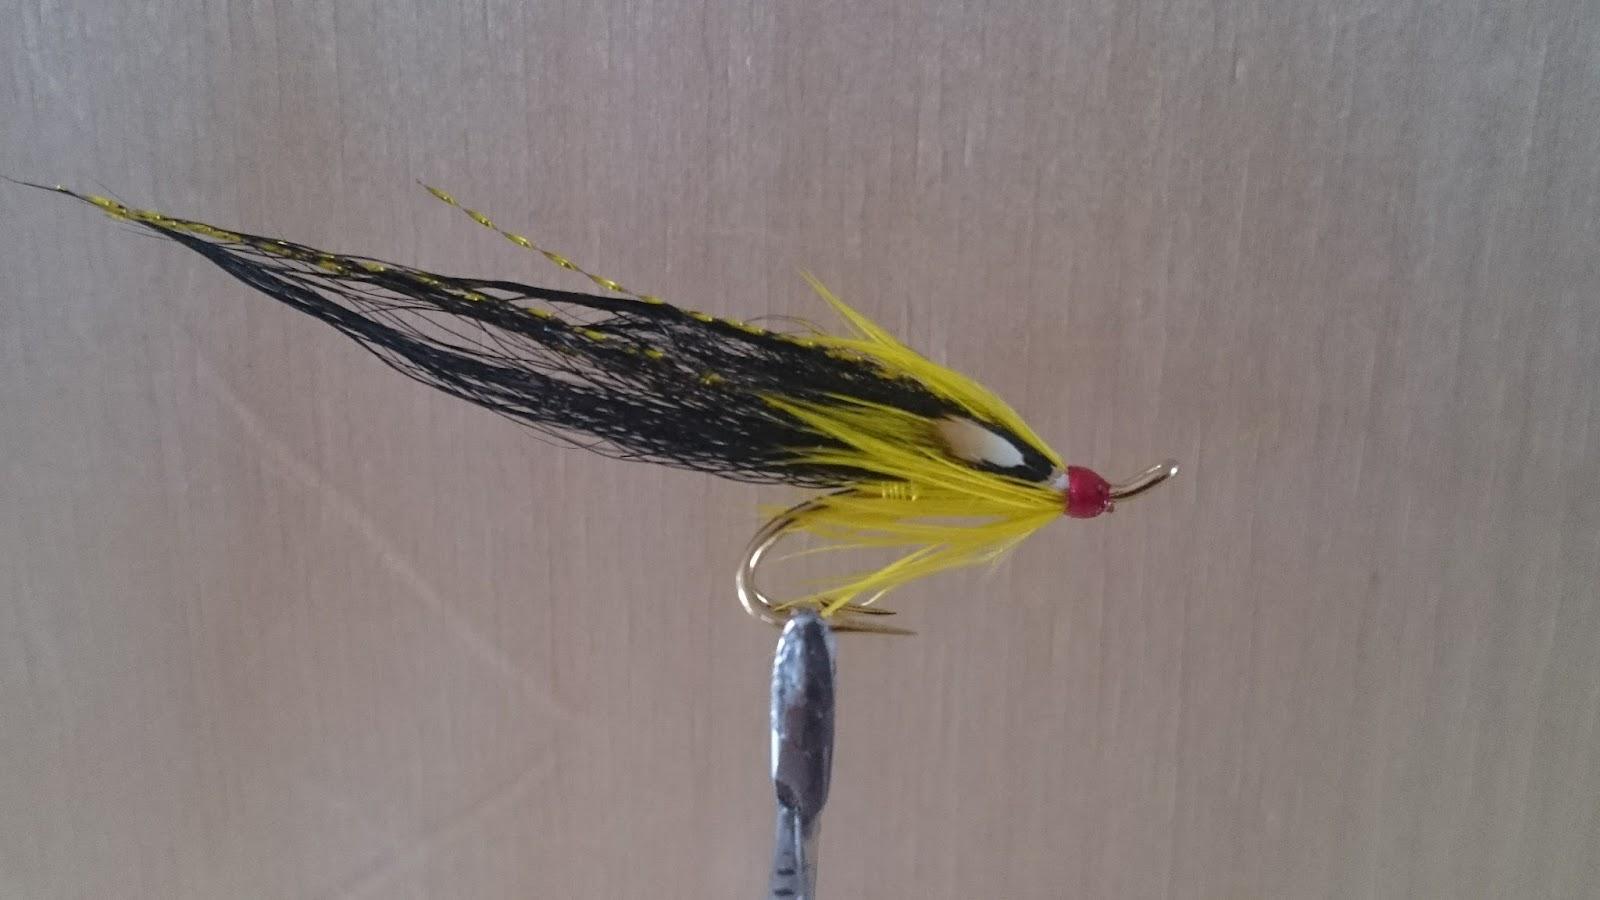 Salmon fly gledswood shrimp salmon fly tay salmon fly for Salon fly